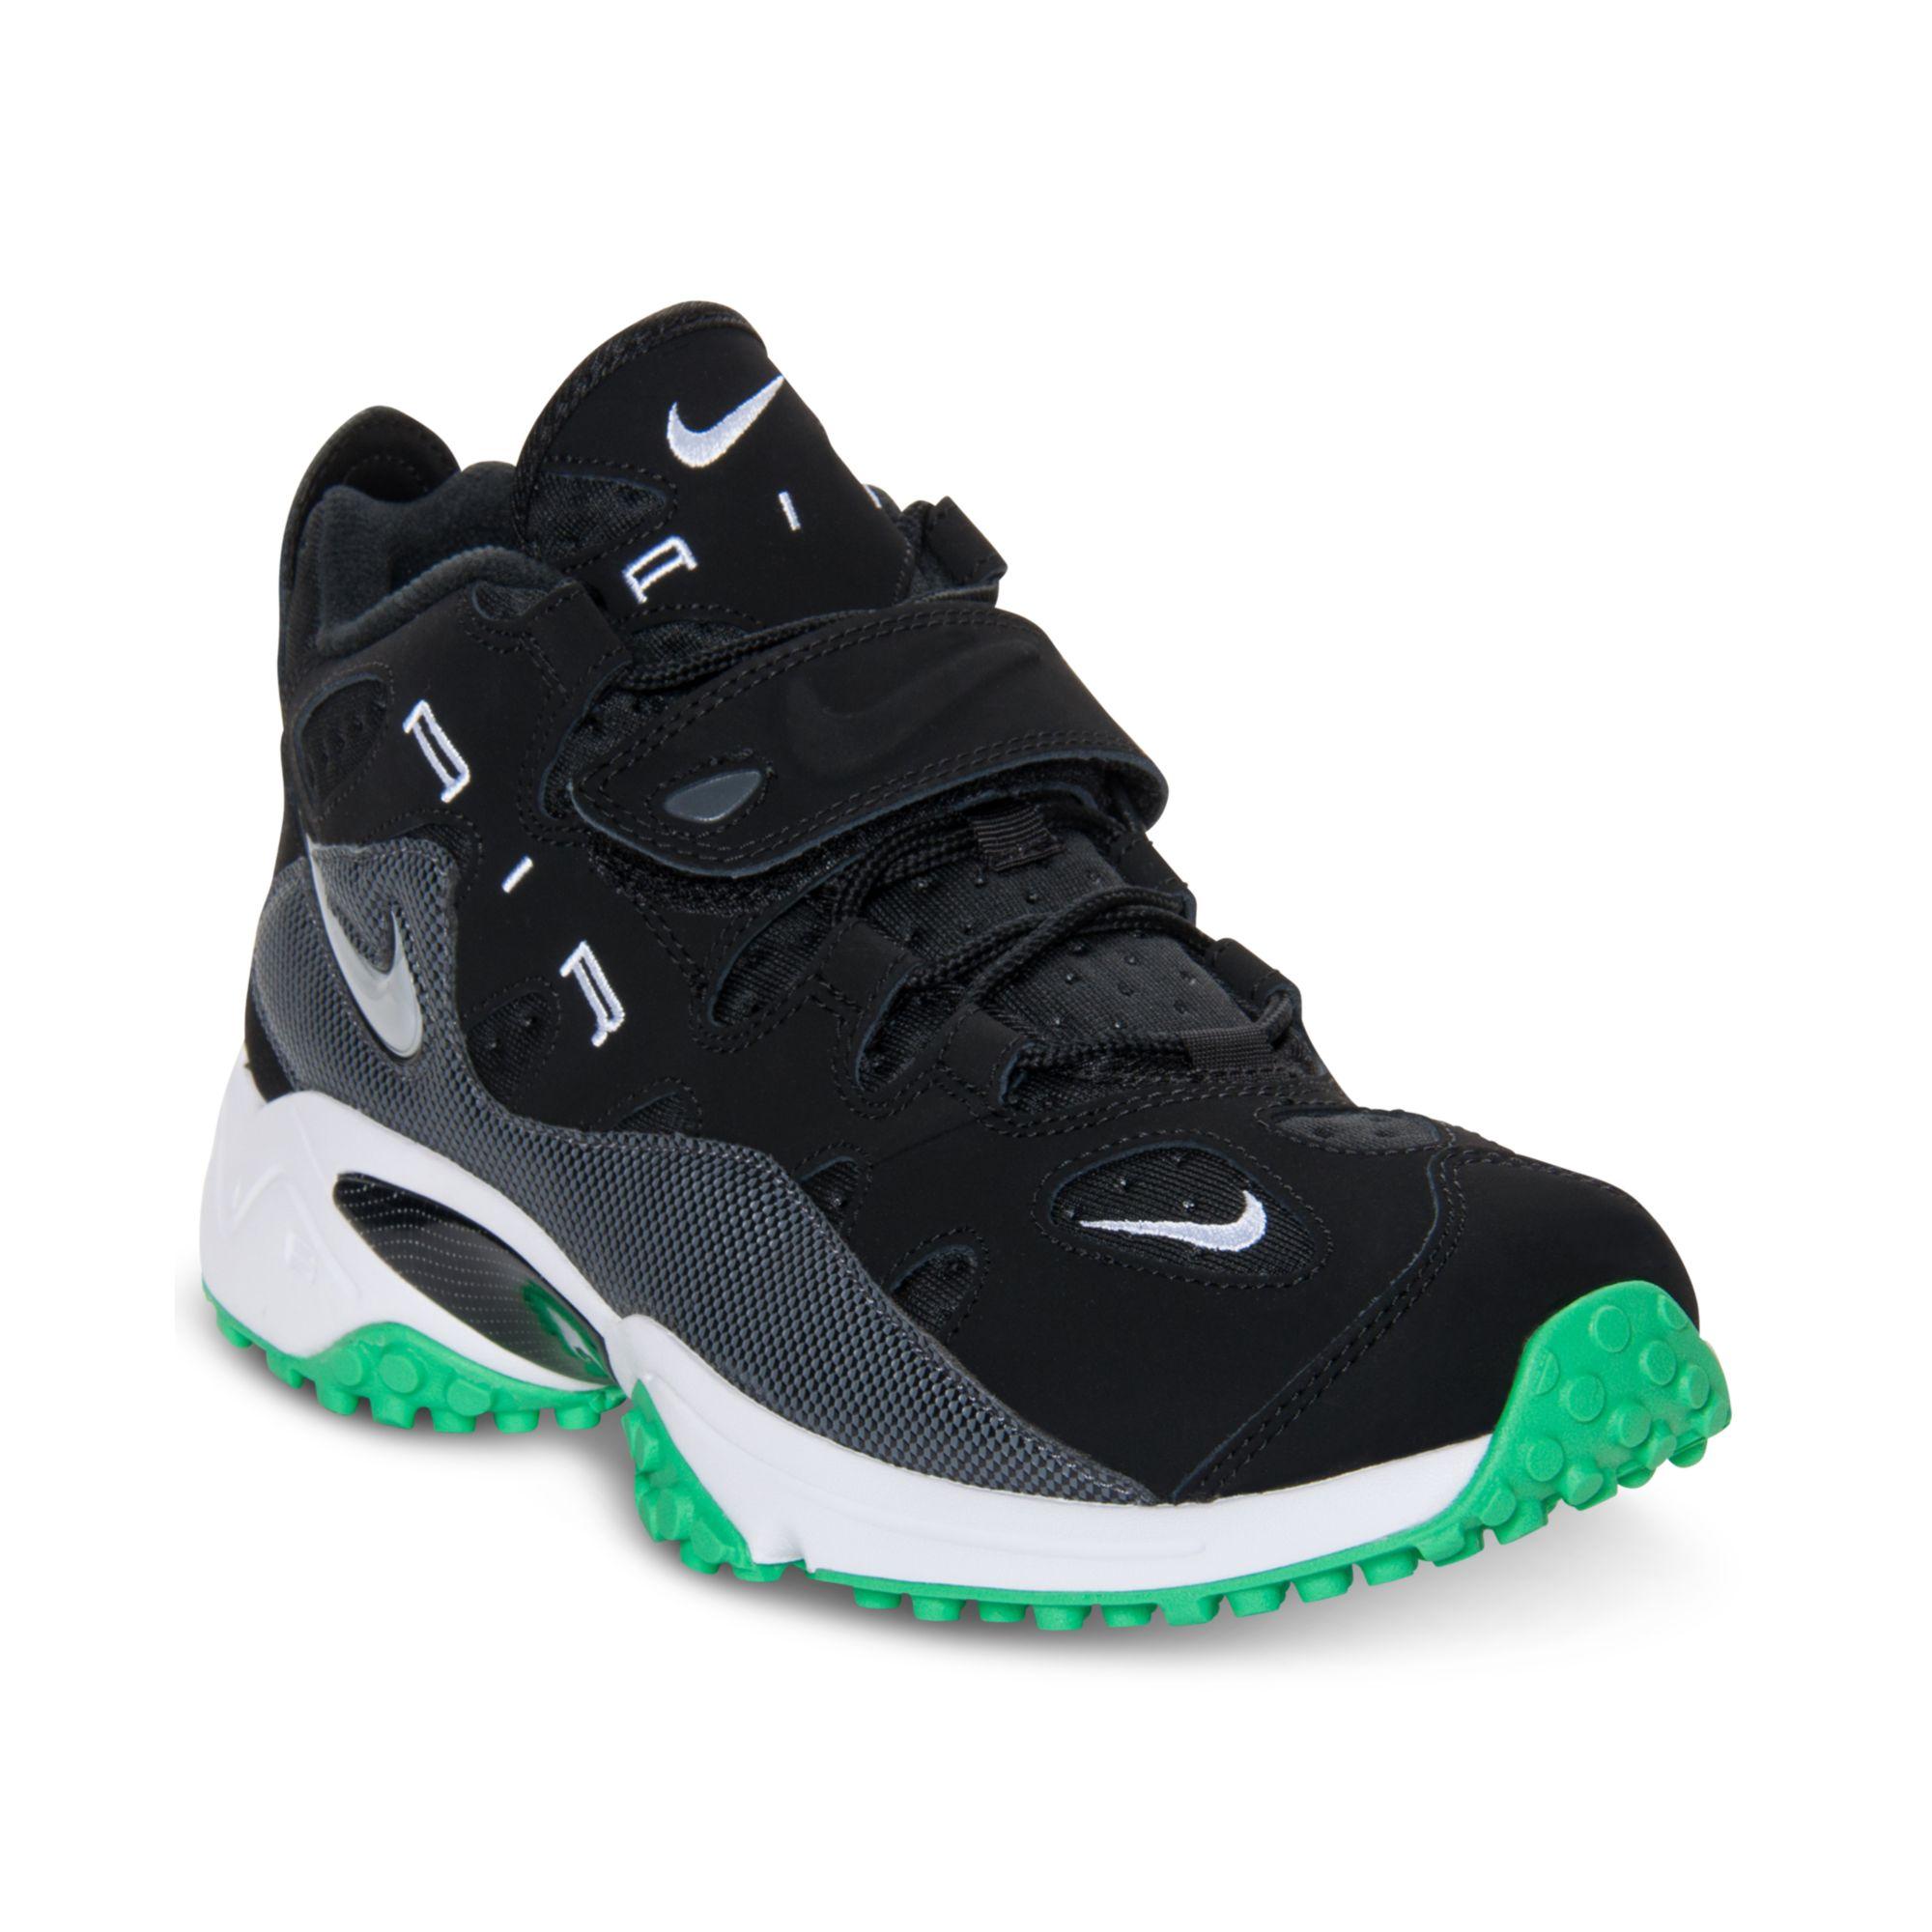 Nike Air Speed Turf Shoes